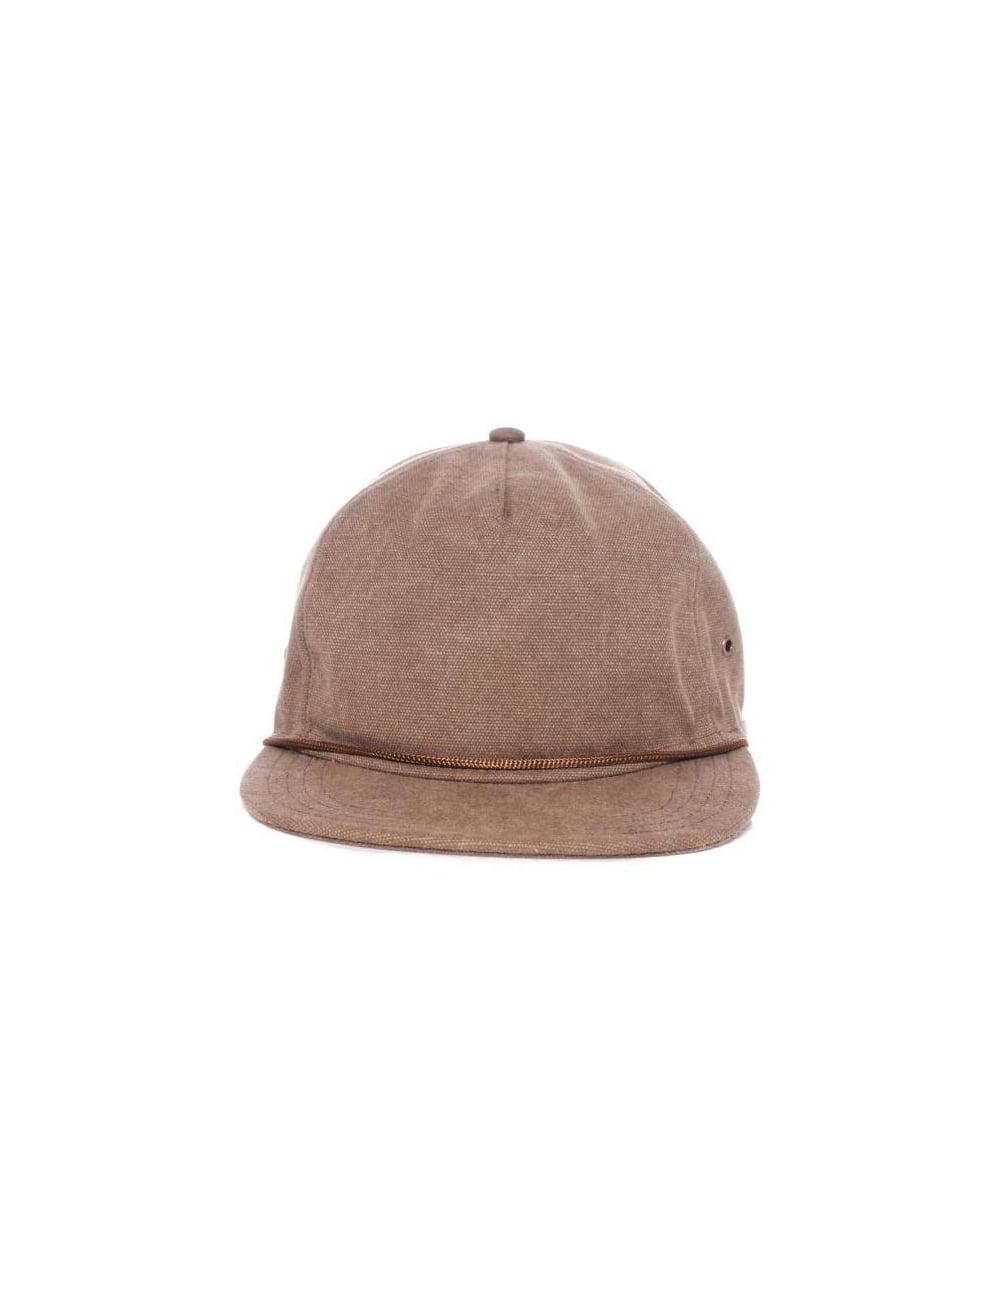 Vans California Redding Cap - Bison - Hat Shop from Fat Buddha Store UK 30083cf3205